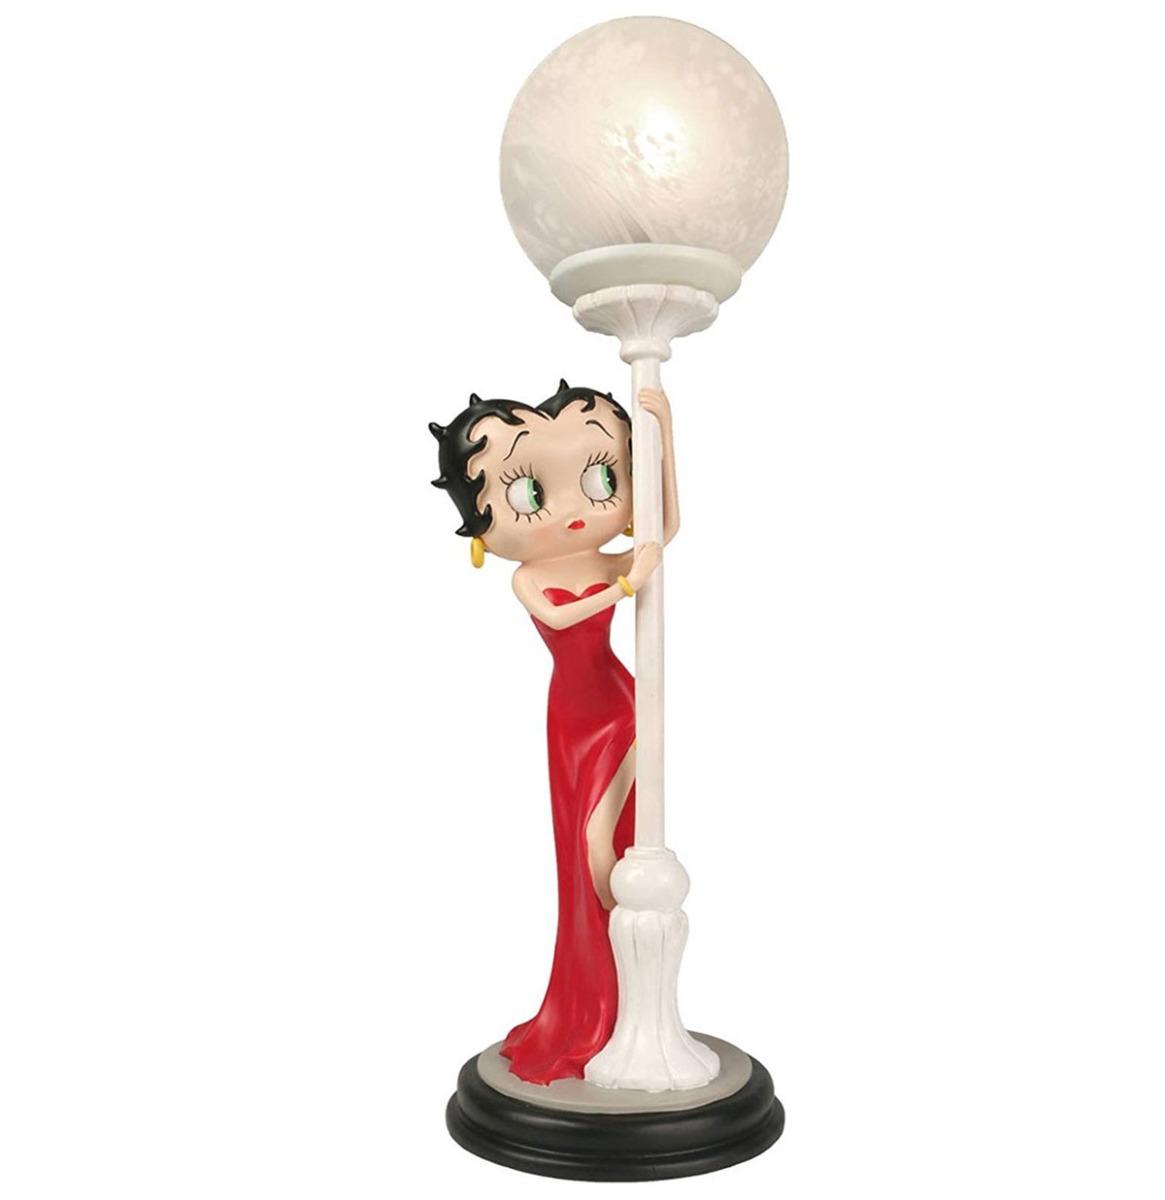 Fiftiesstore Betty Boop Speelt Verstoppertje In Rode Jurk Tafellamp 48cm